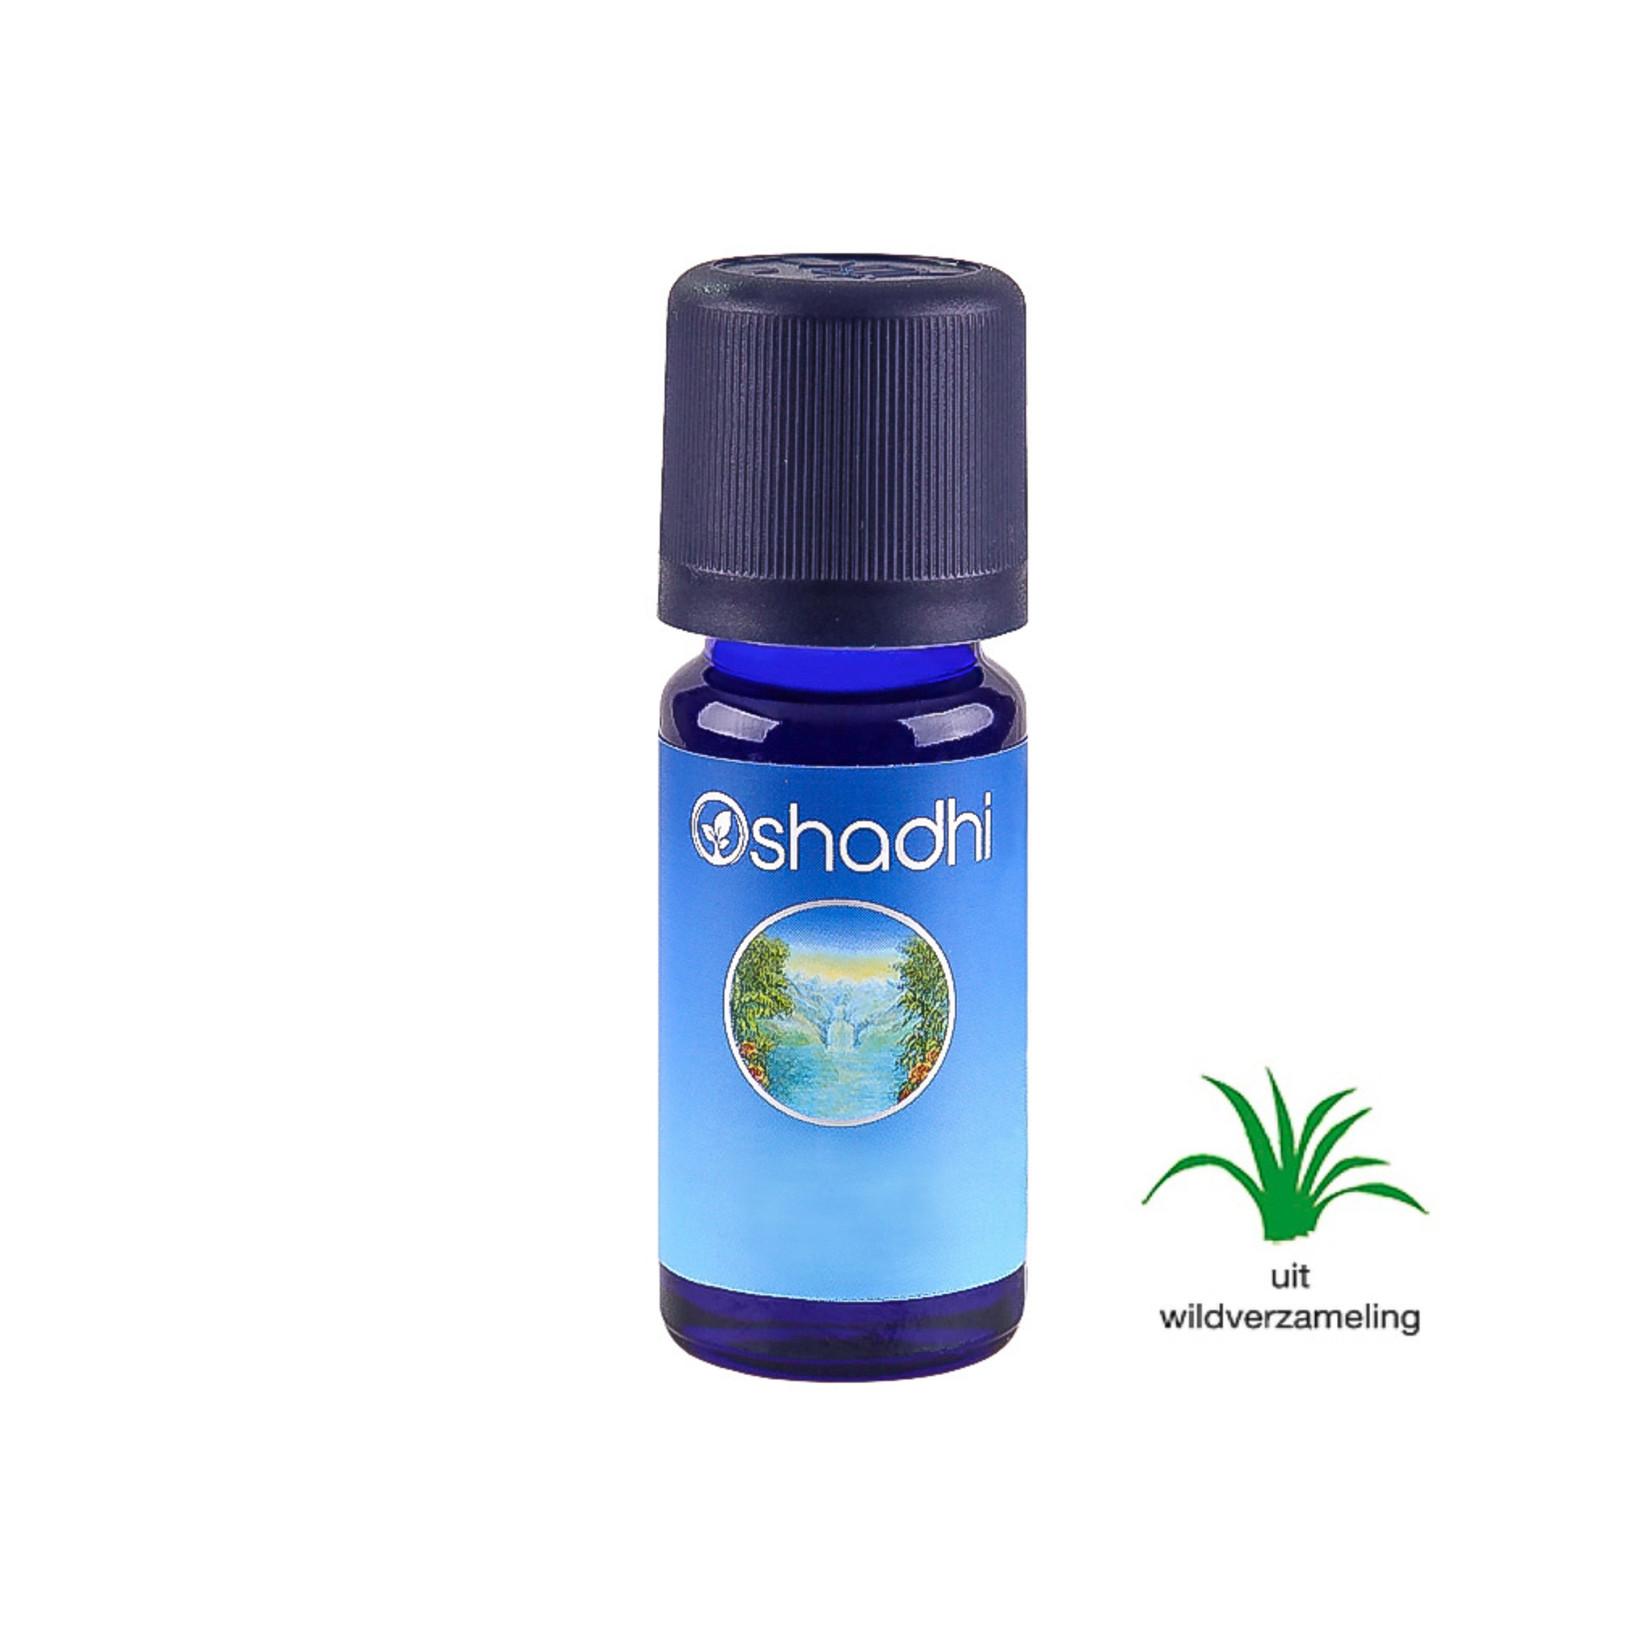 E.O. Ravensara Aromatica - Oshadhi - 10ml